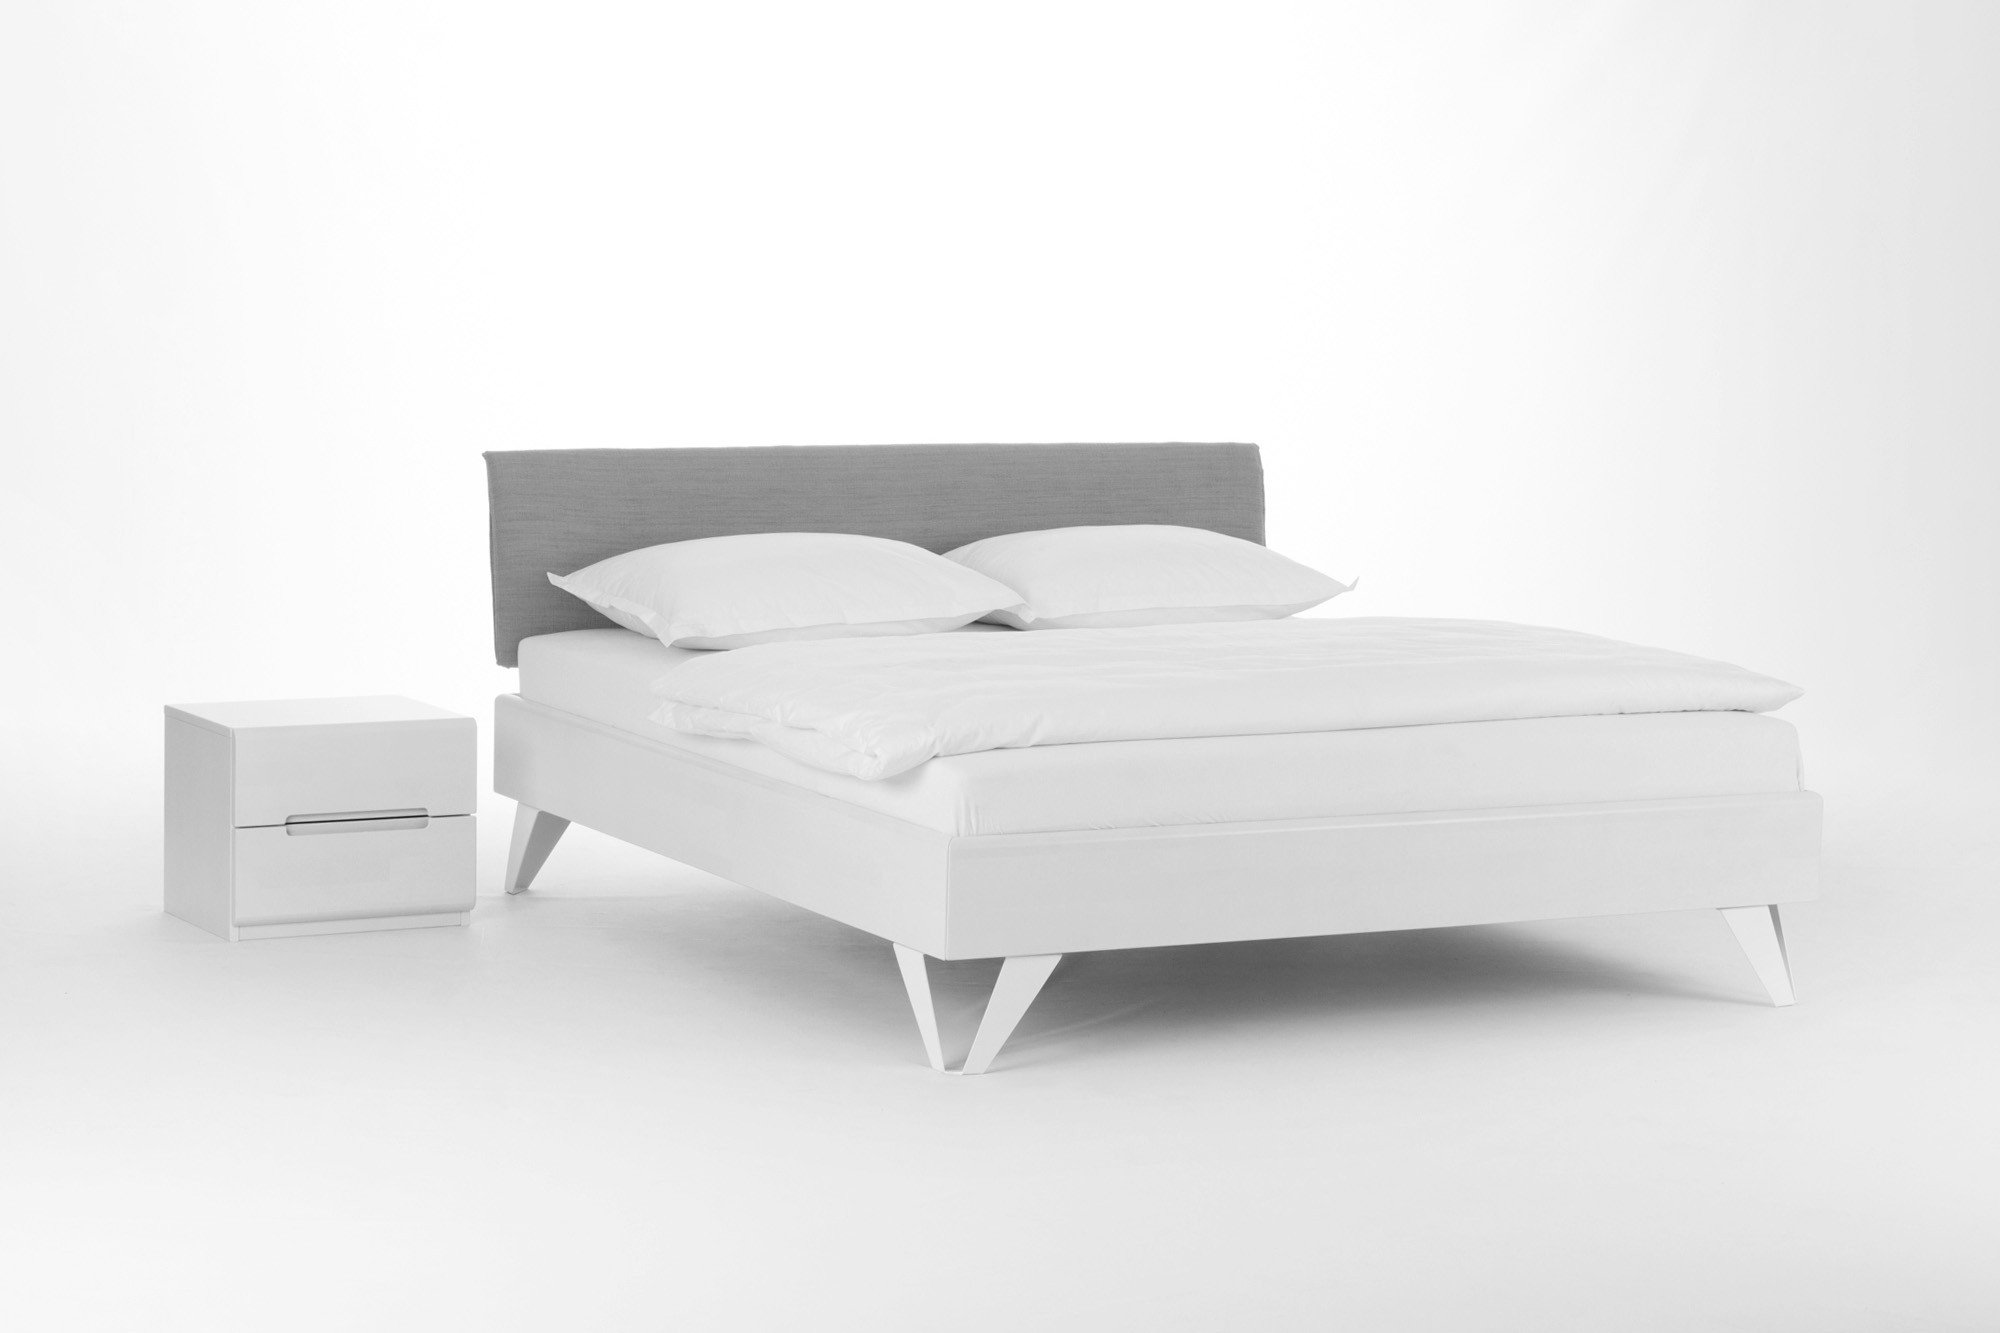 include dico m bel bett buche wei gebeizt m bel letz ihr online shop. Black Bedroom Furniture Sets. Home Design Ideas